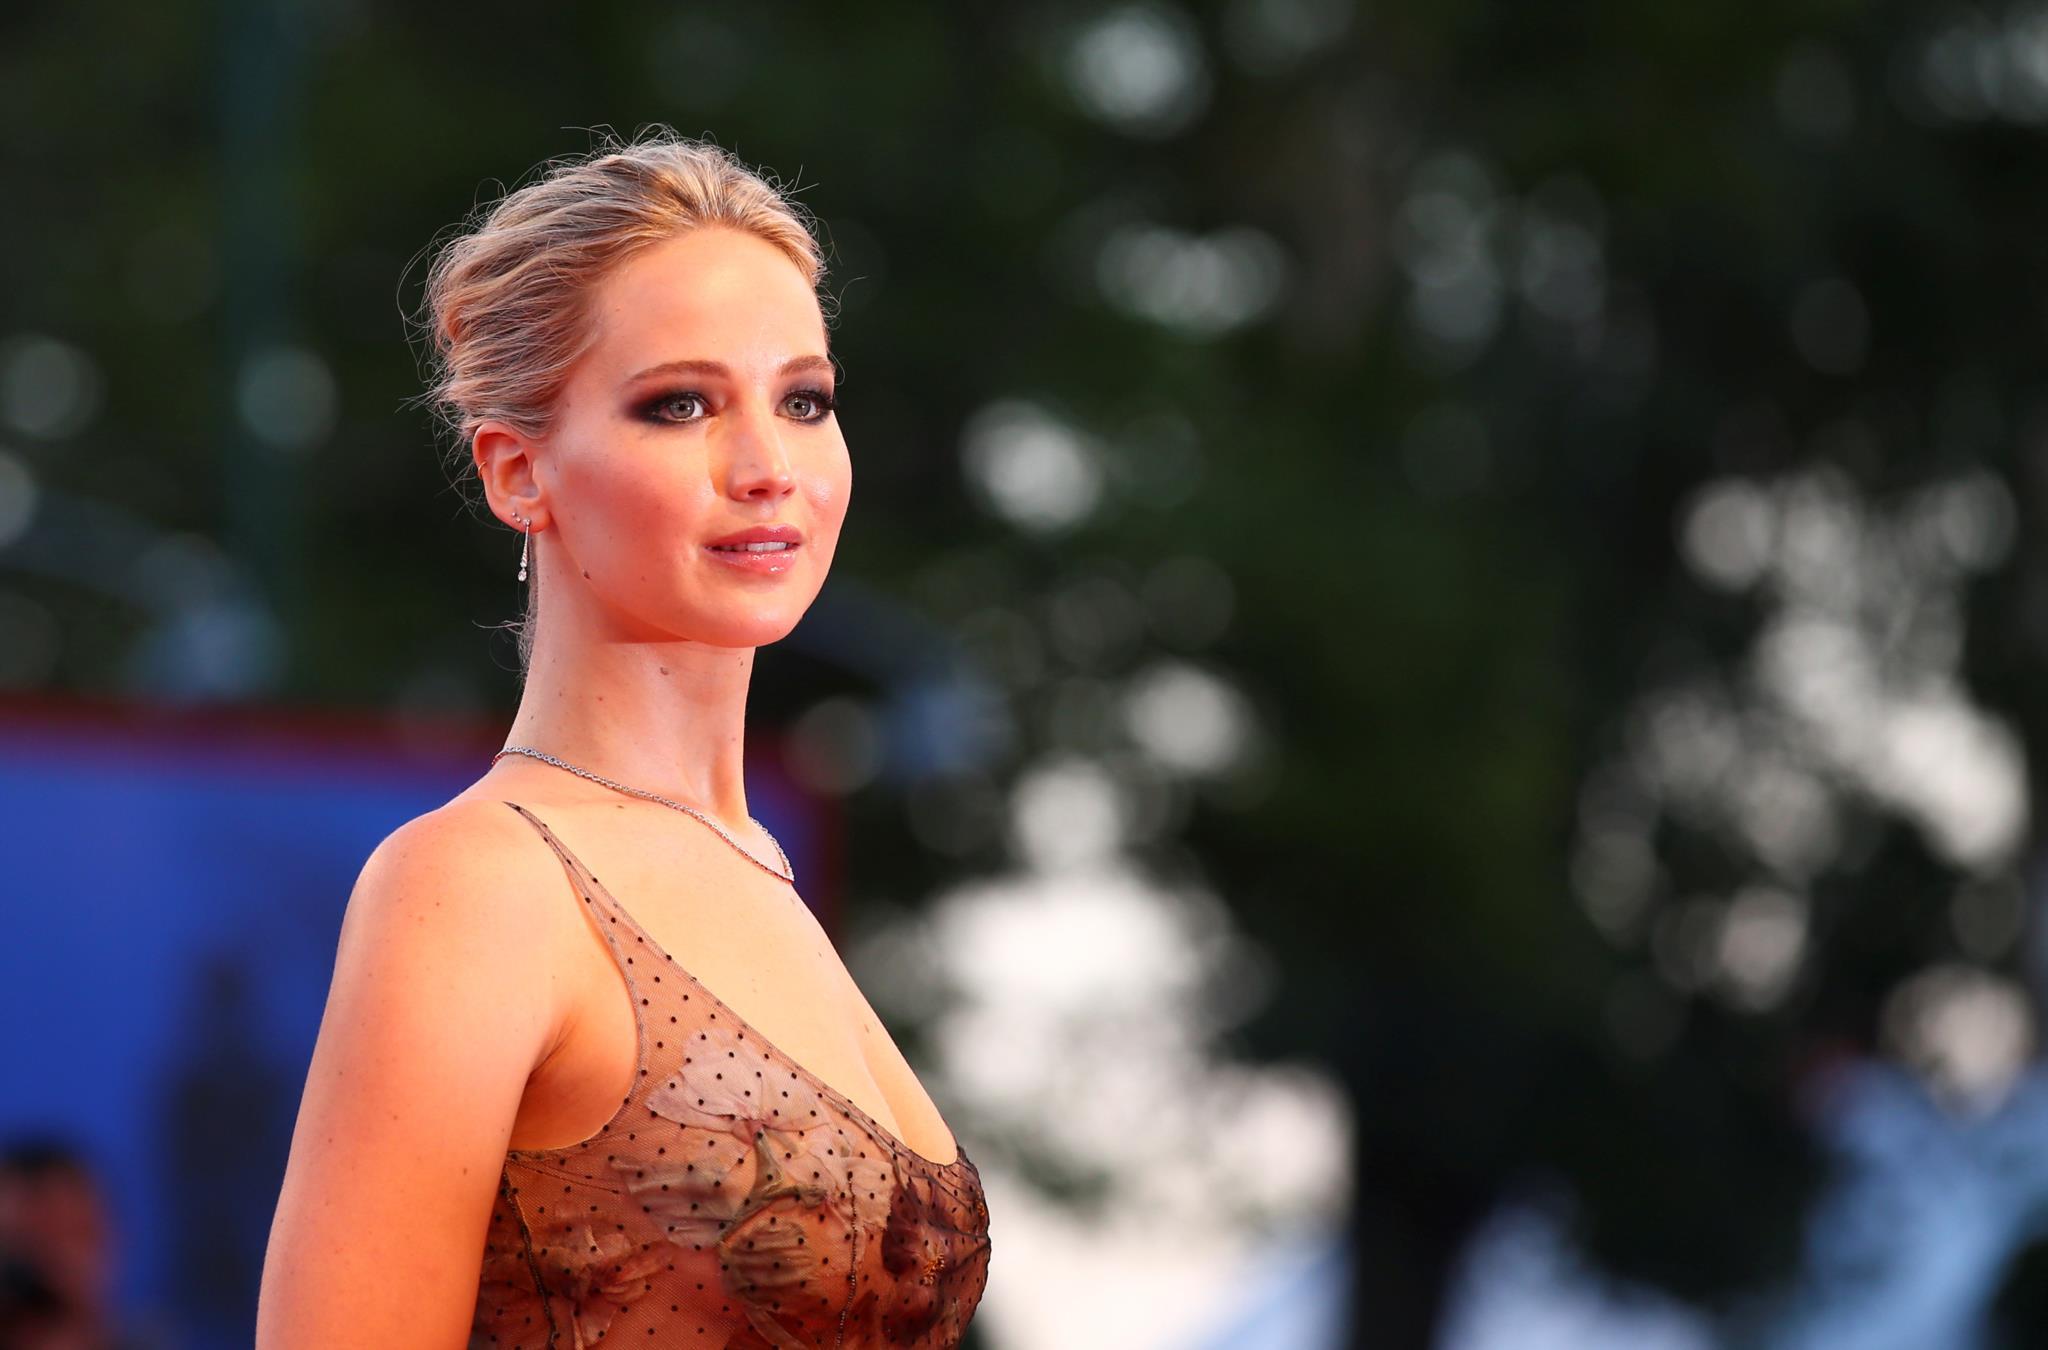 A actriz americana Jennifer Lawrence, em Dior